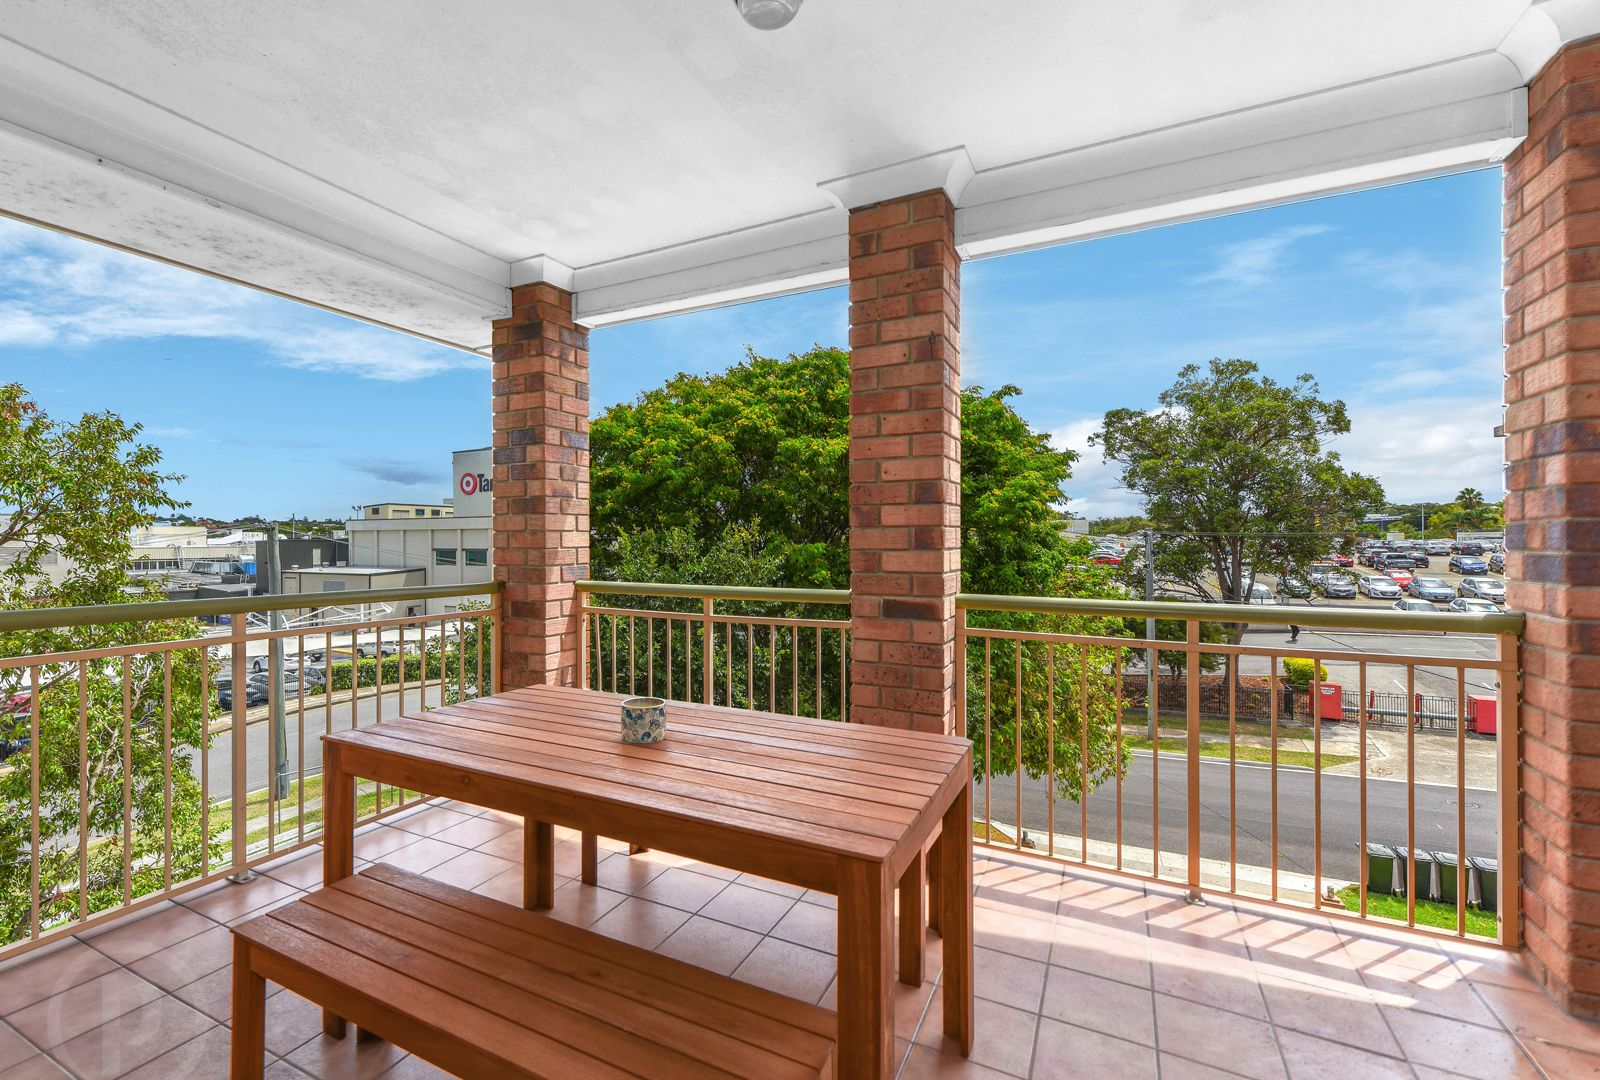 6/34 Kreutzer Street, Nundah QLD 4012, Image 2